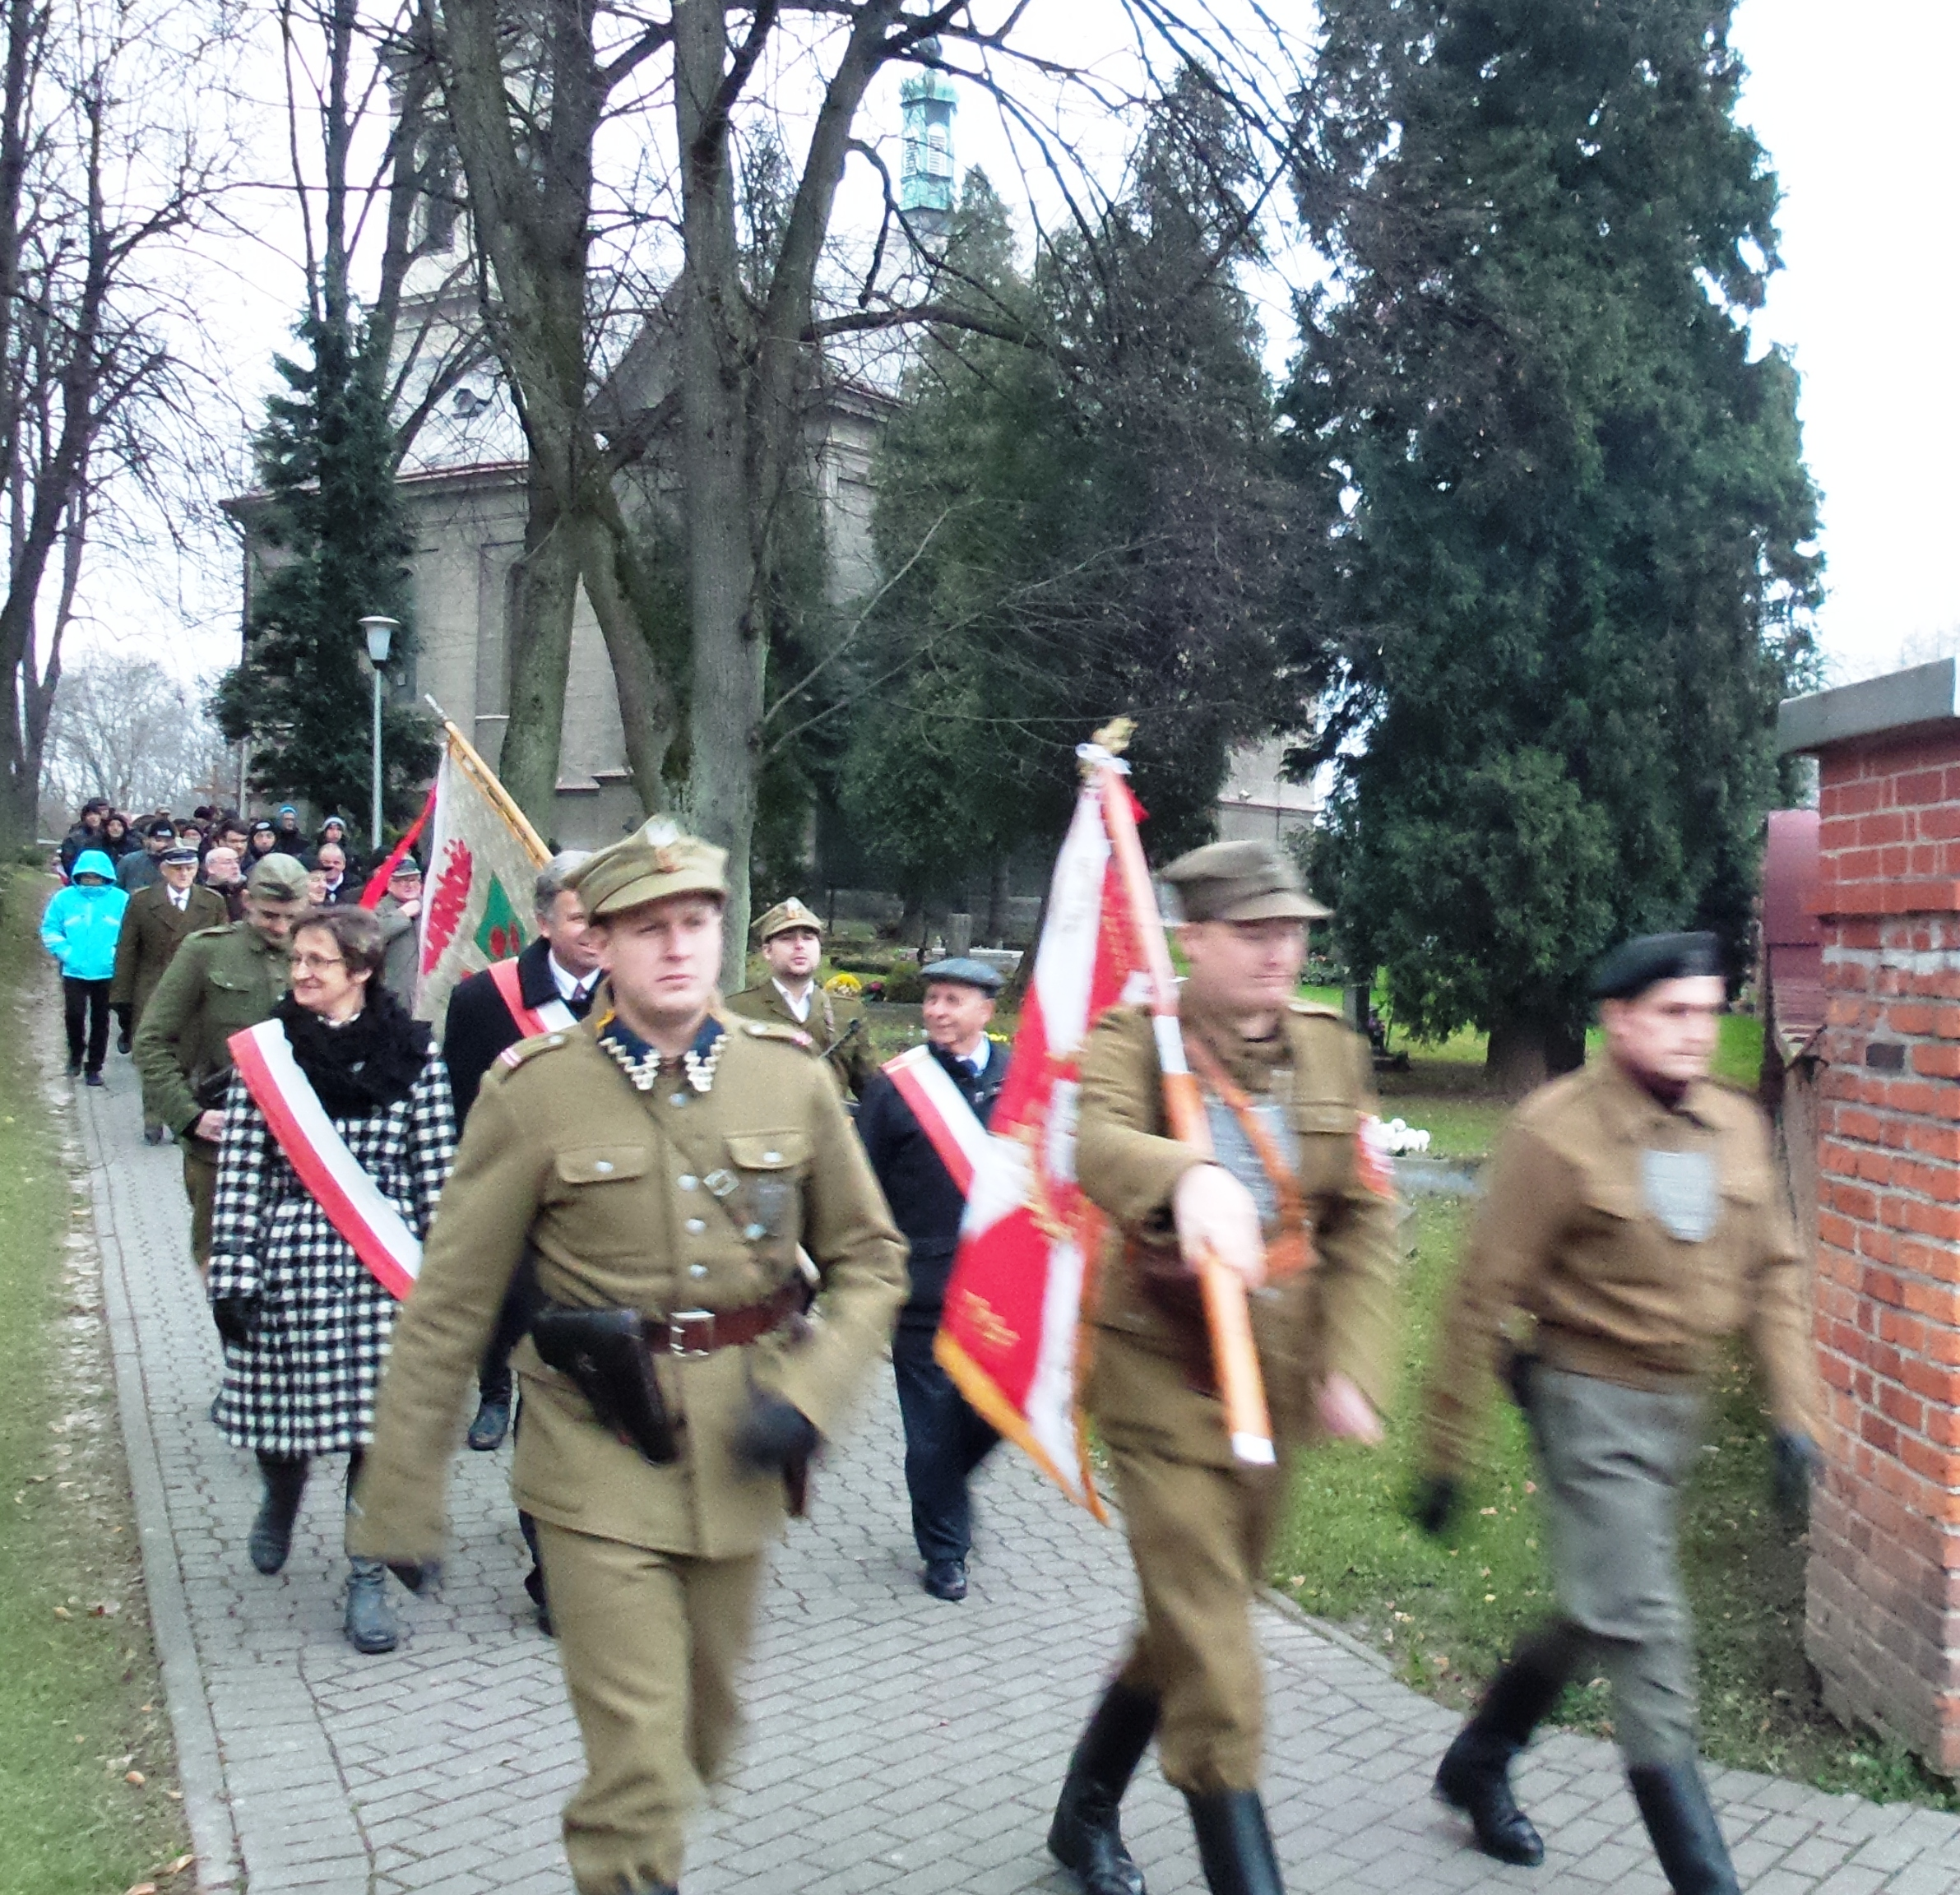 Czechowice 29.11.2014